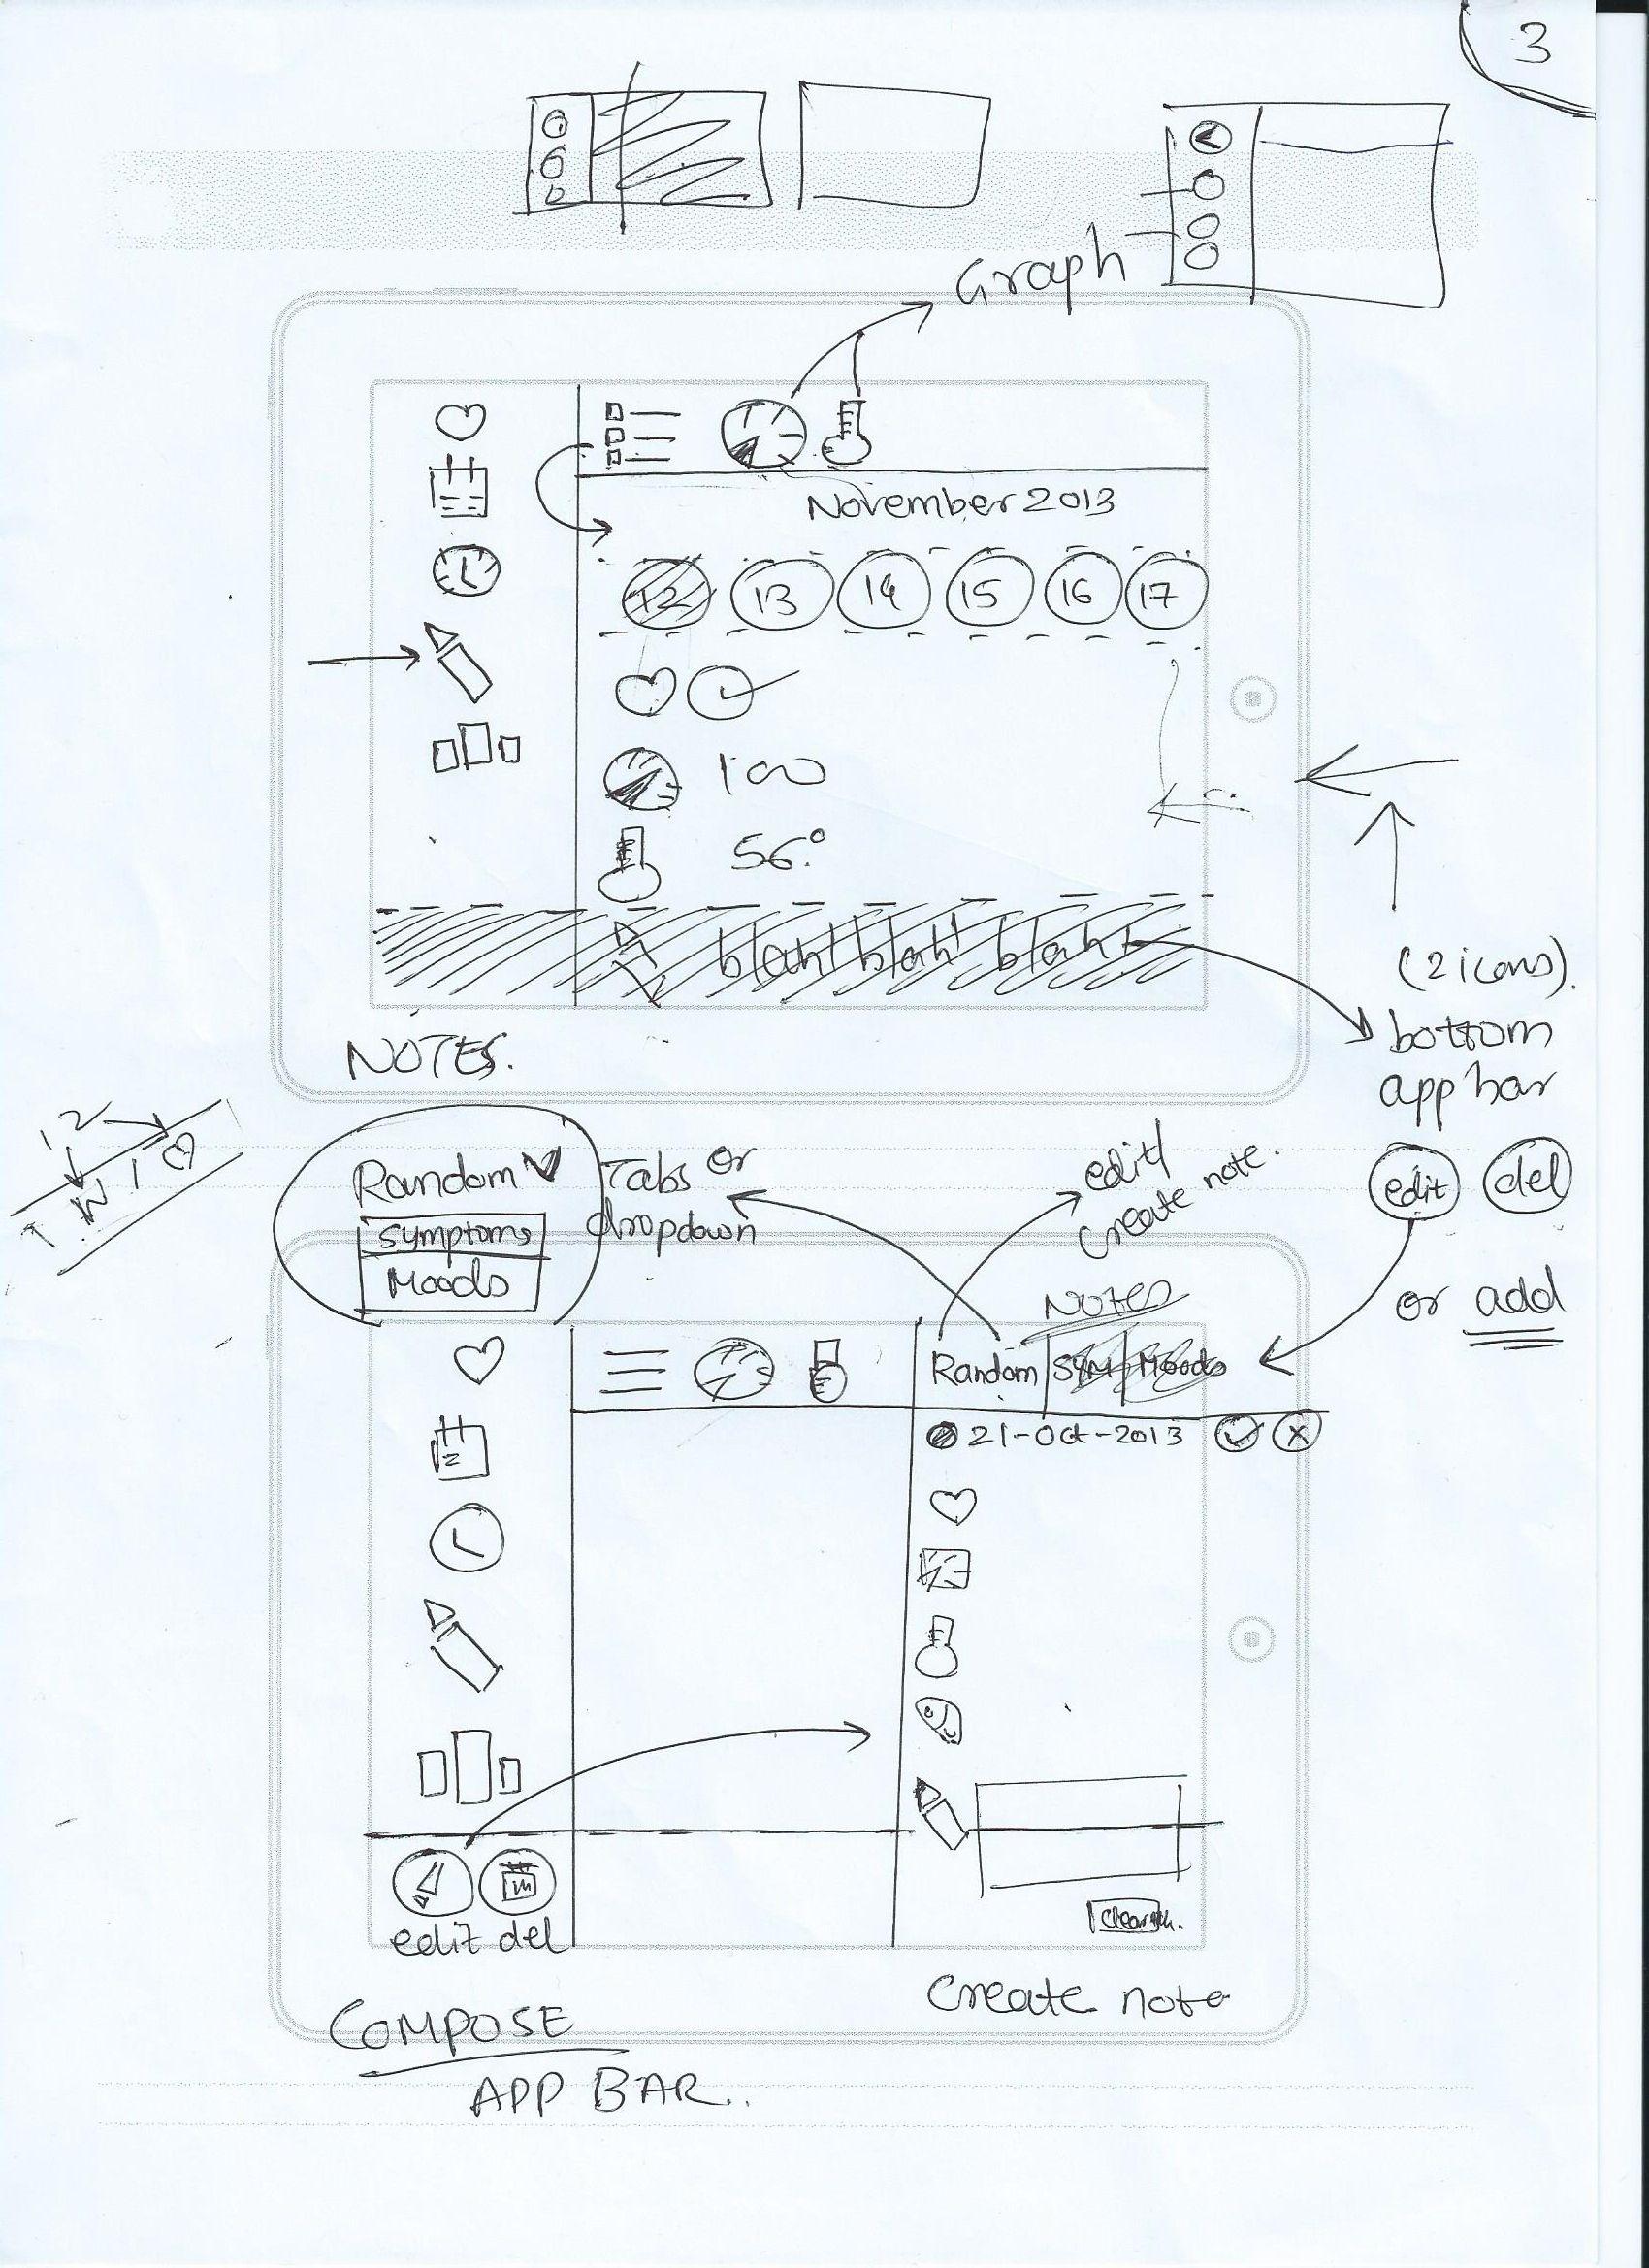 #3E6D8D22369752 Pin By Roseane Martins On Prototyping Pinterest Meest effectief Low Fidelity Wireframes 3685 behang 170023383685 afbeeldingen